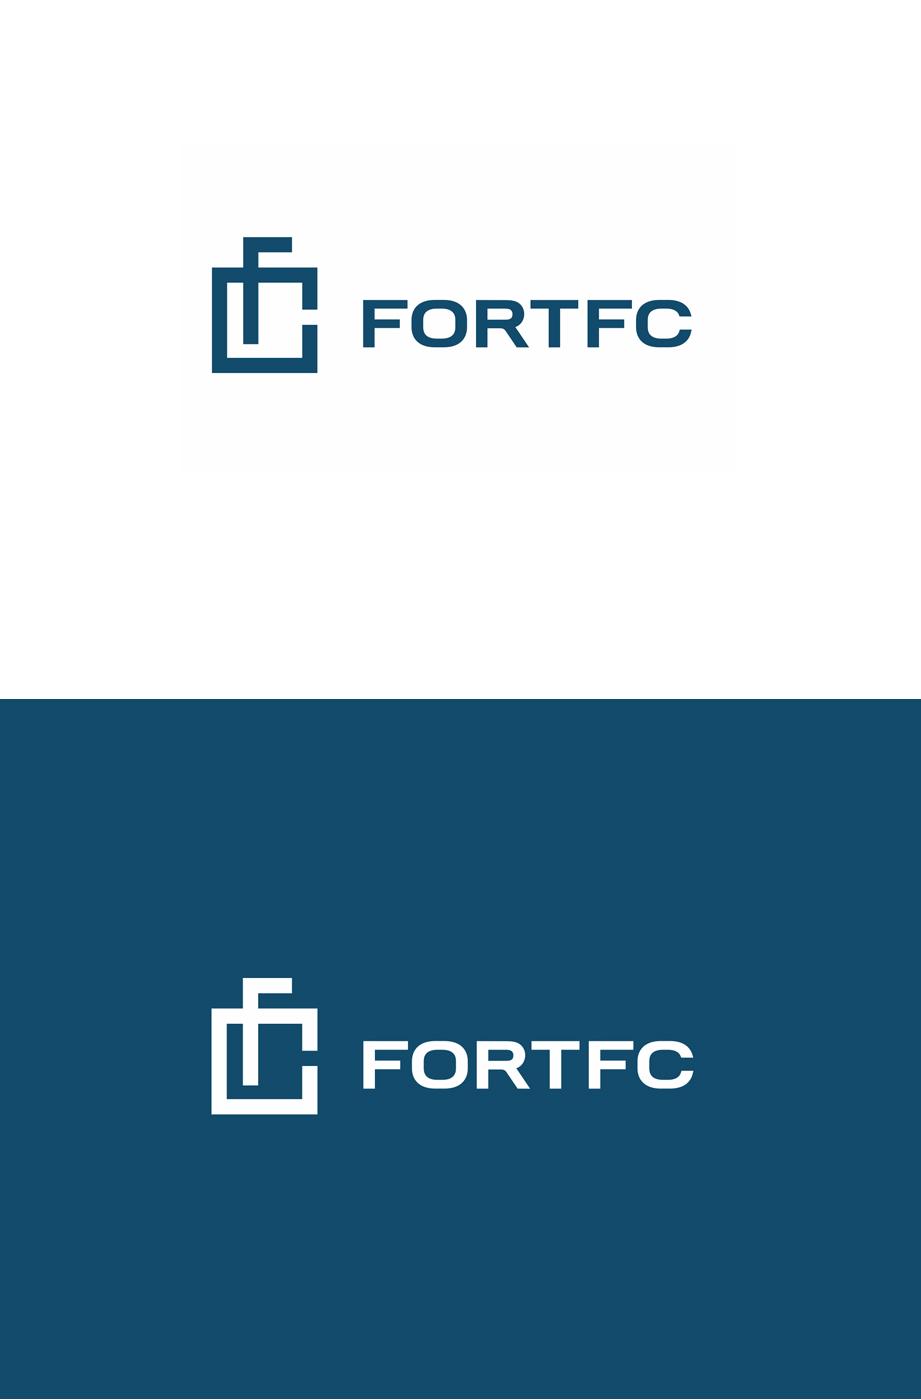 Разработка логотипа финансовой компании фото f_6195a86bcc45320c.jpg